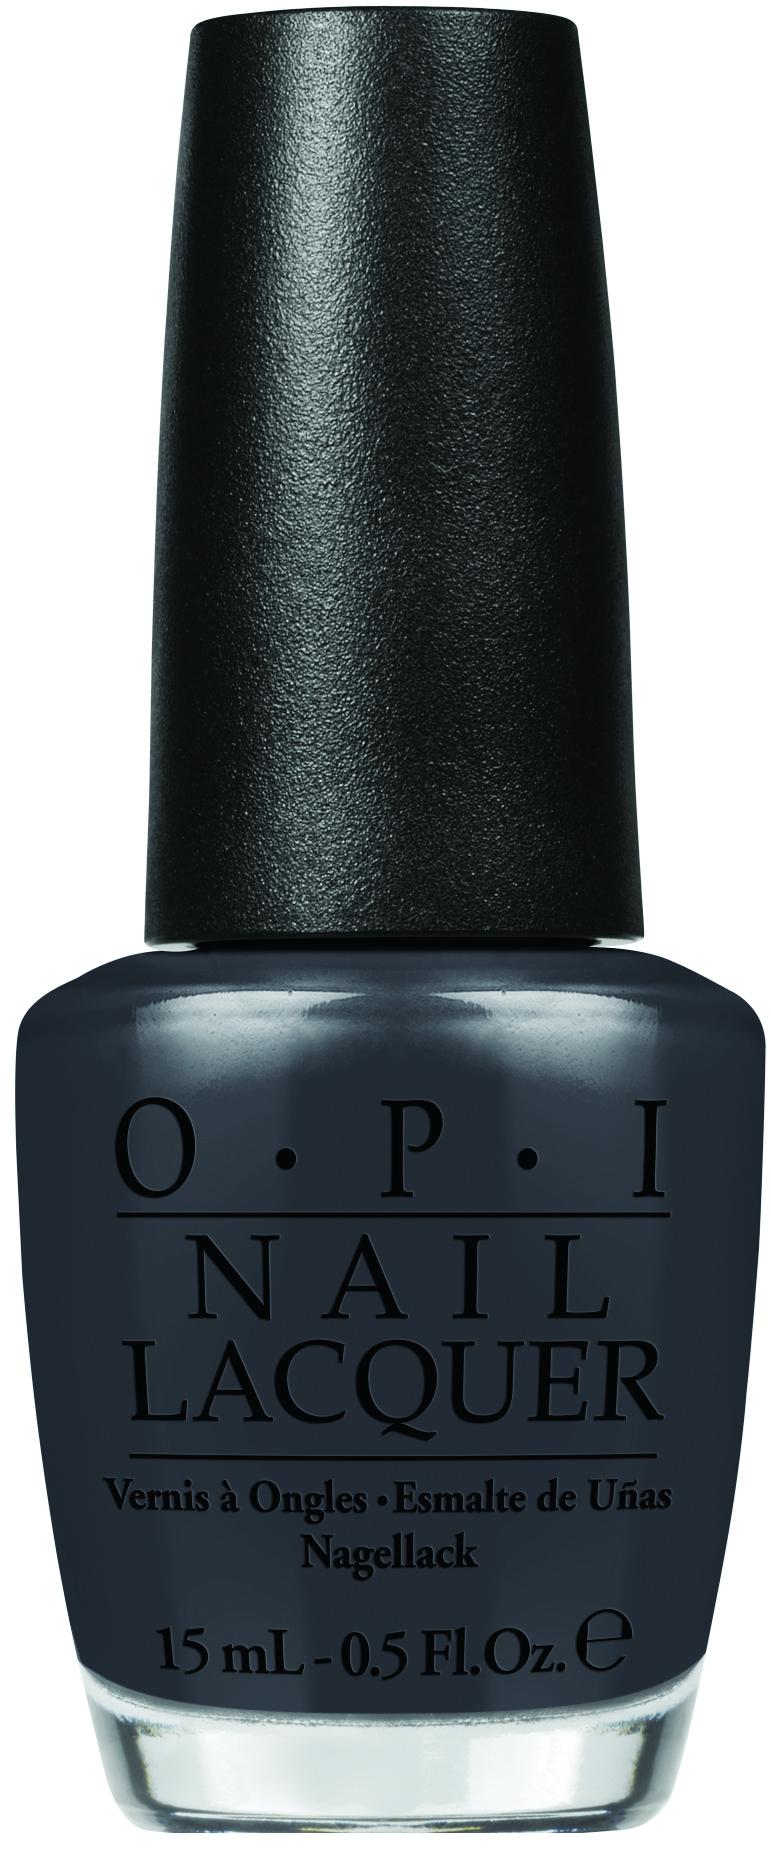 Opi, Dark Side Of The Mood 16,80 €.